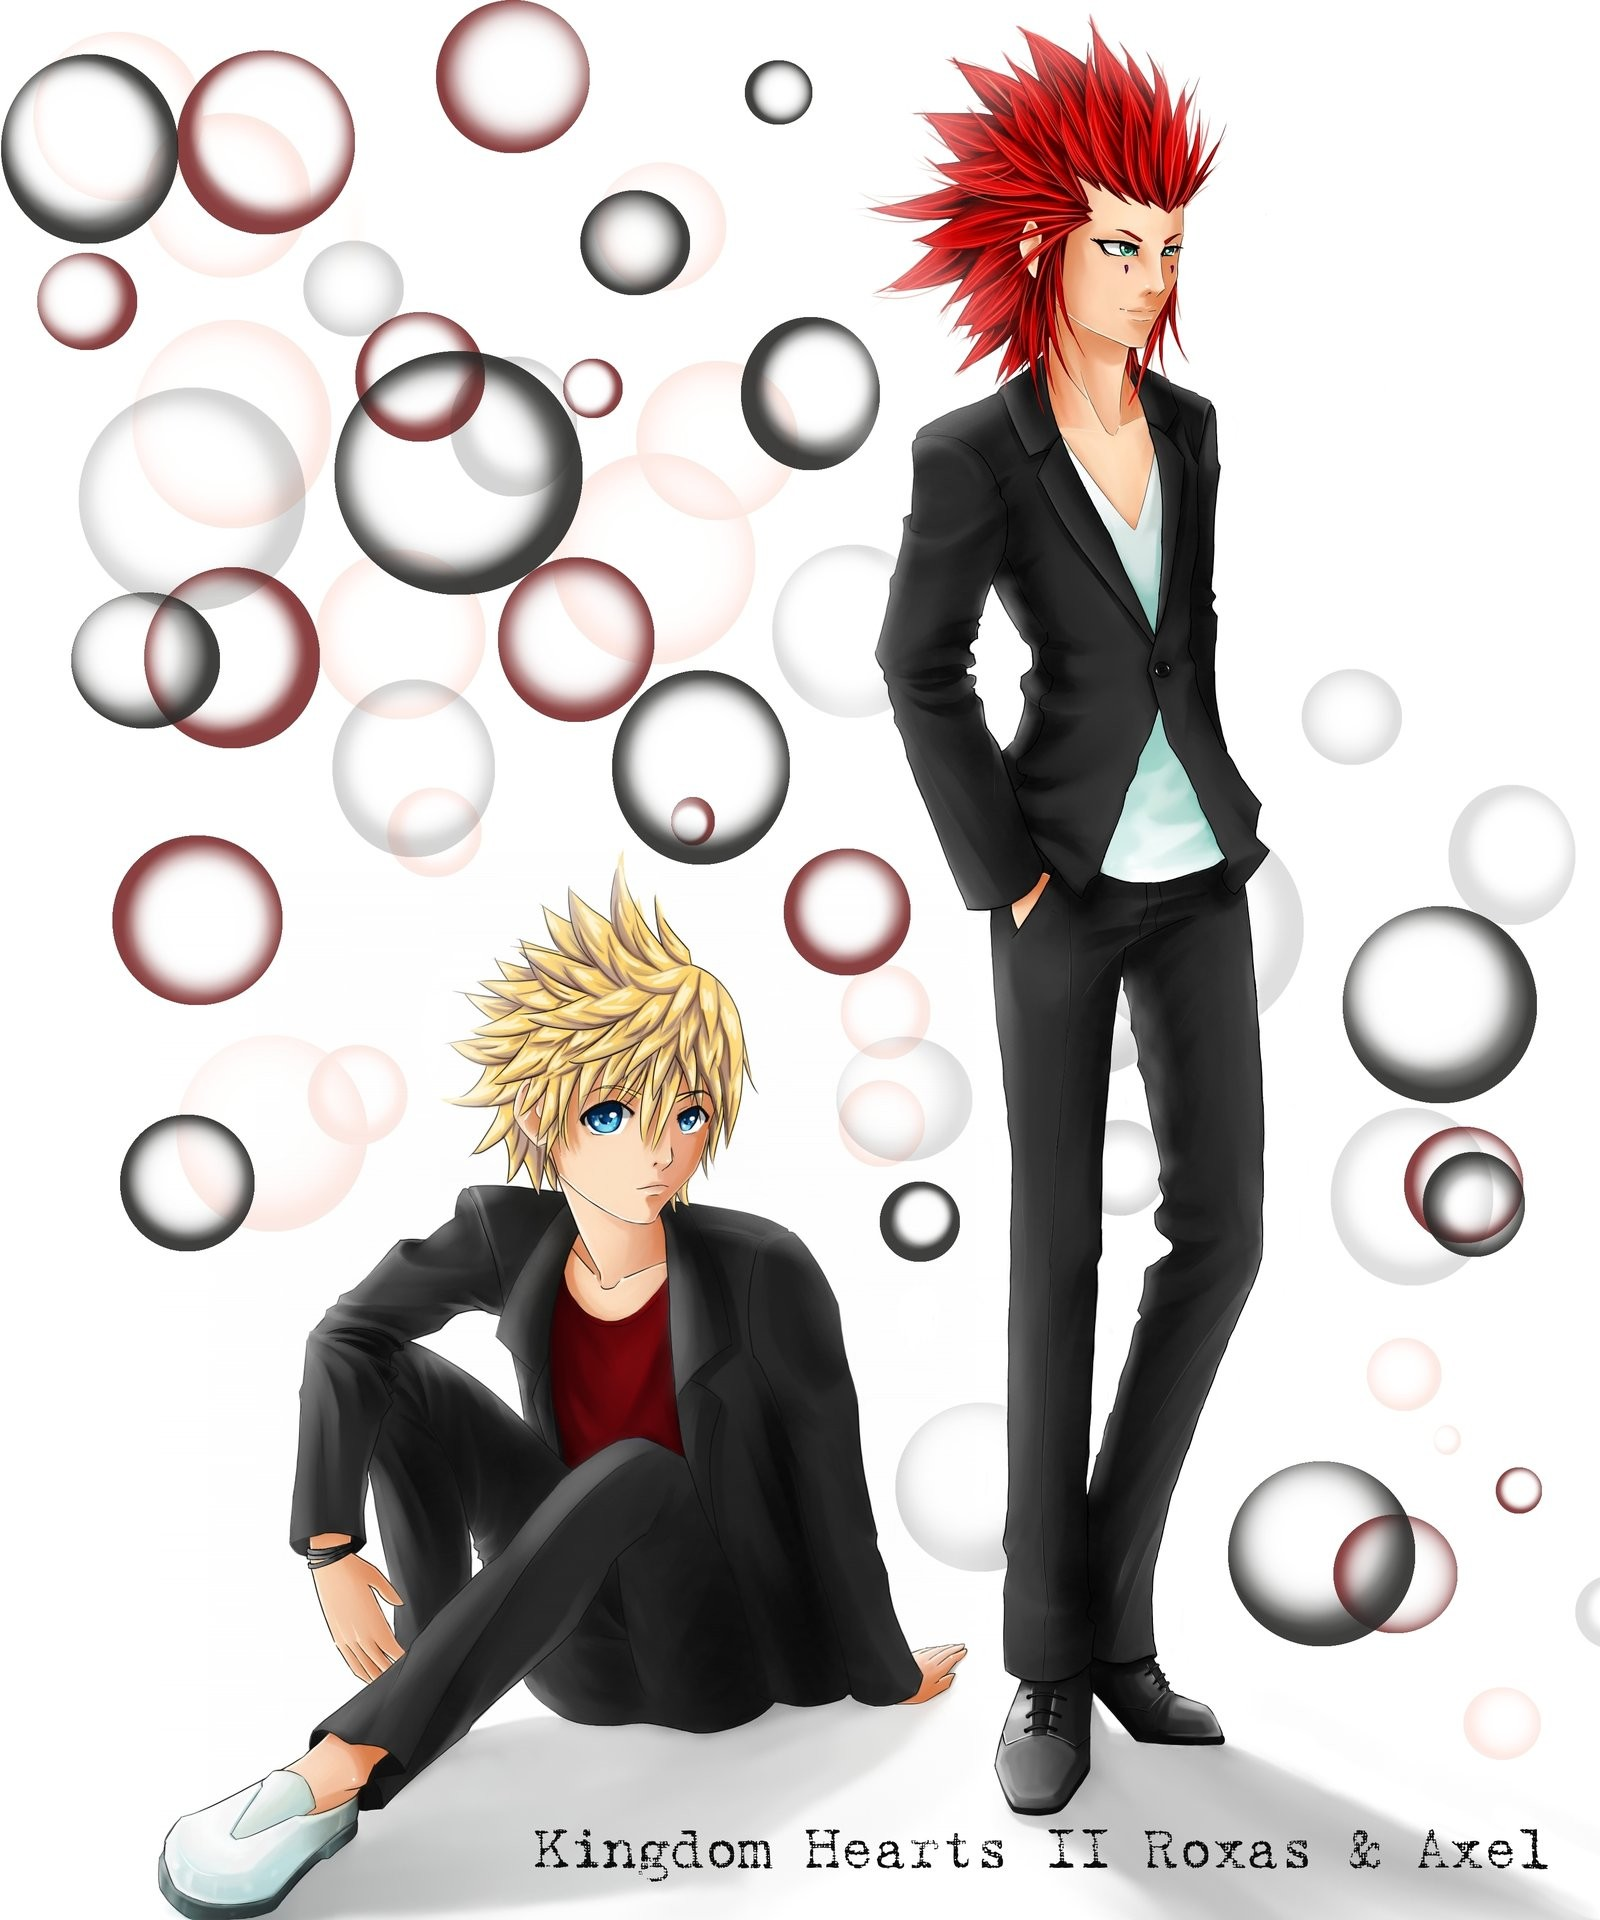 … SilverdragonAmai CP Kingdom Hearts II Roxas and Axel by SilverdragonAmai